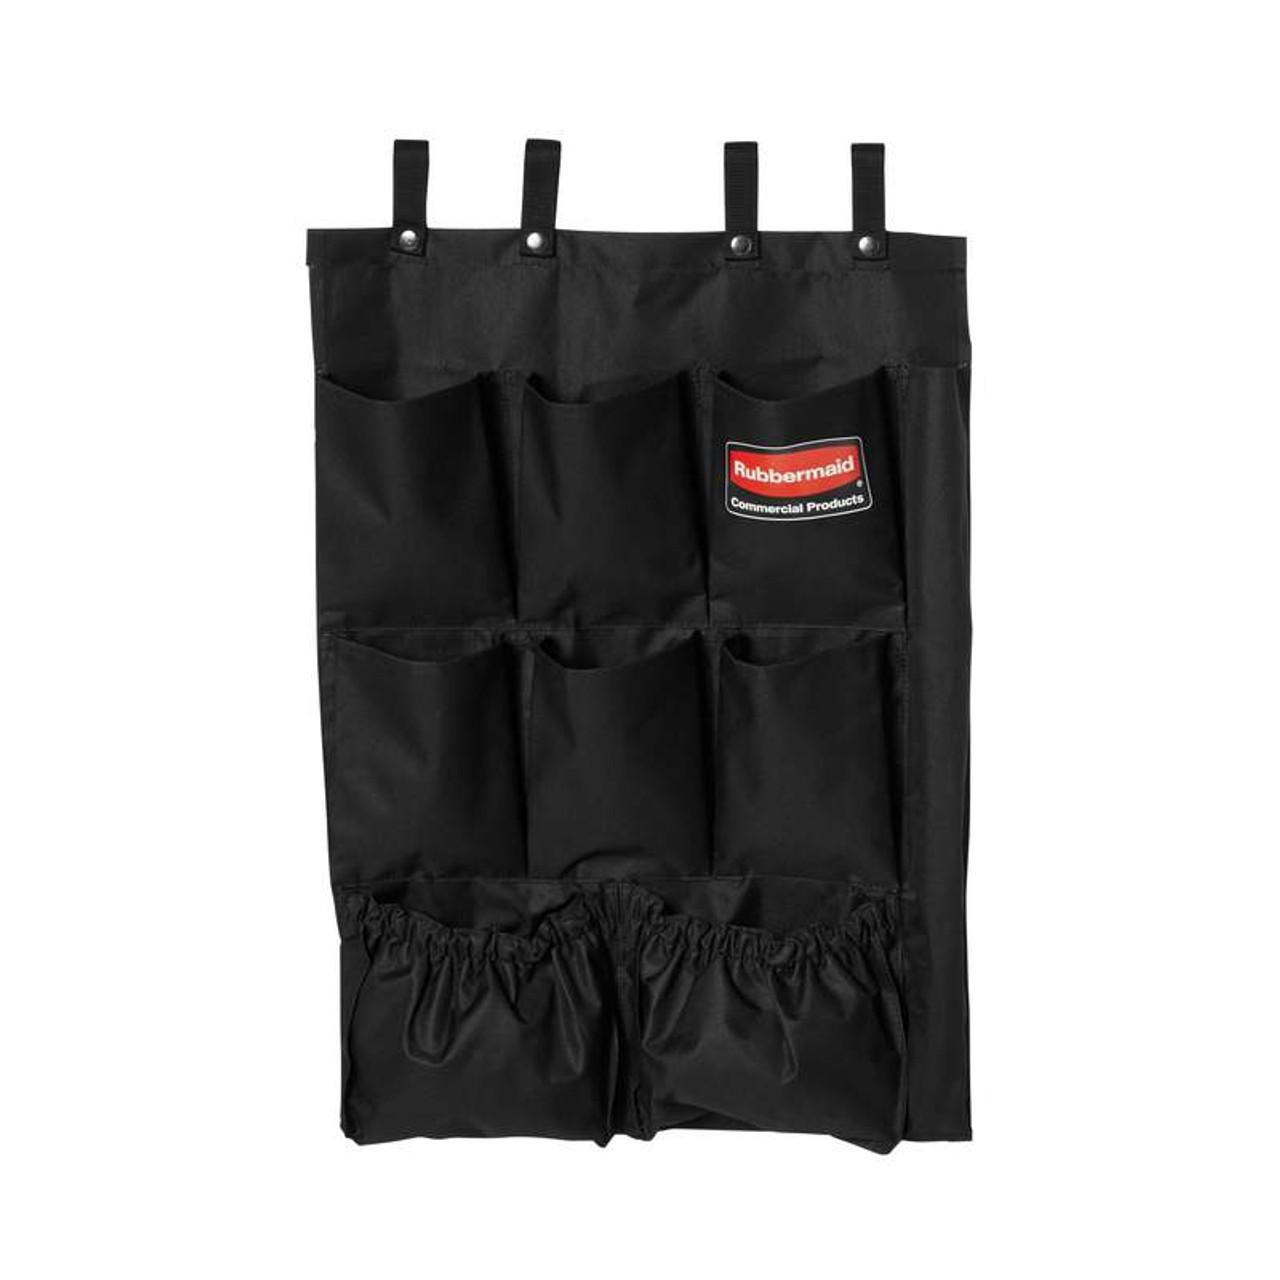 Rubbermaid Pocket Fabric Organiser - FG9T9000BLA